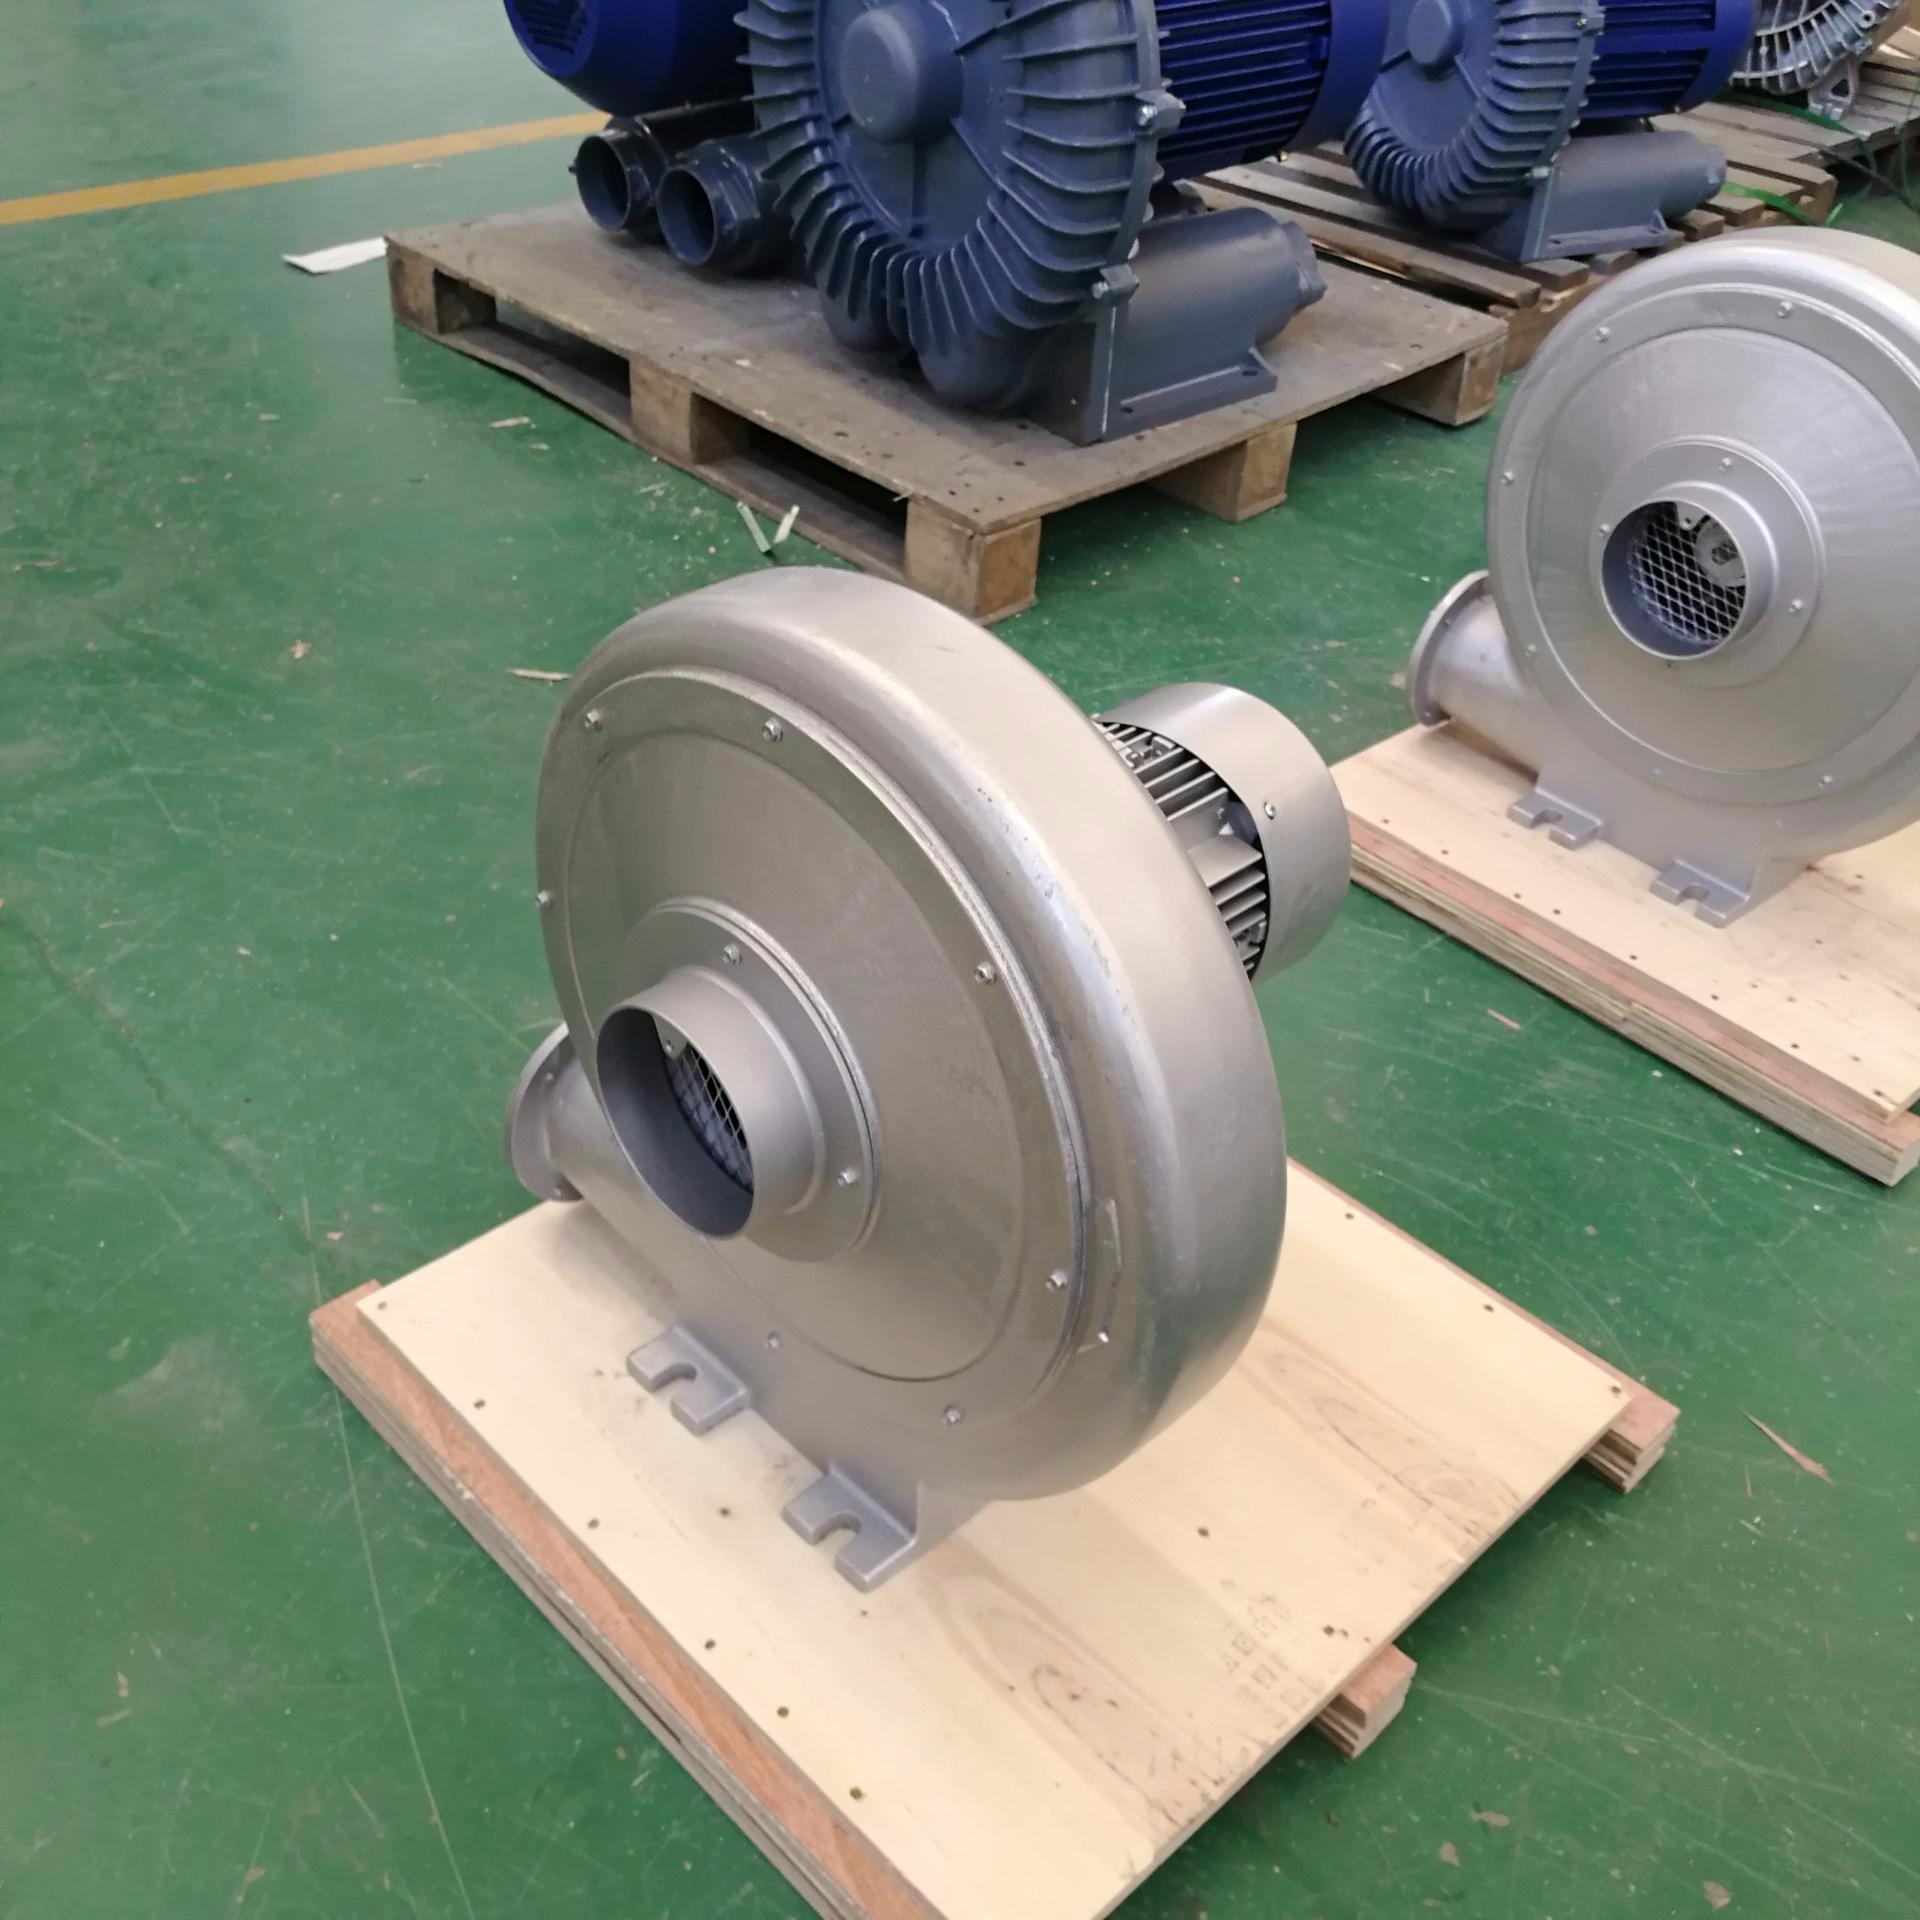 CX1/4透浦式中壓鼓風機 0.2KW送風鼓風機 低噪音中壓風機